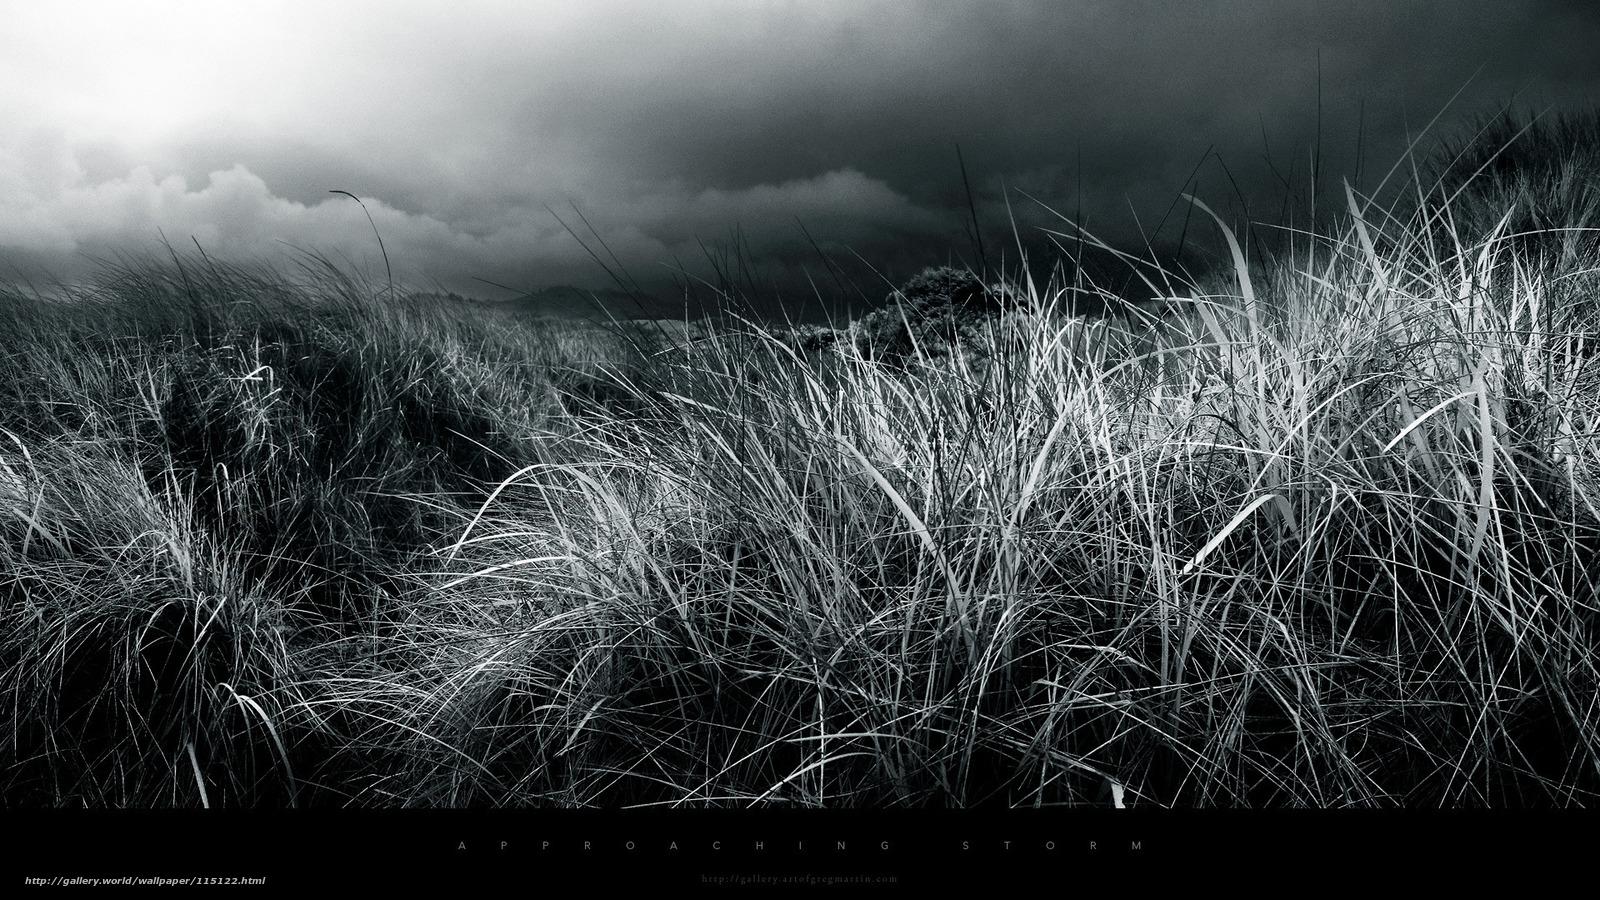 Tlcharger fond d 39 ecran herbe sombre noir et blanc fonds for Fond ecran sombre